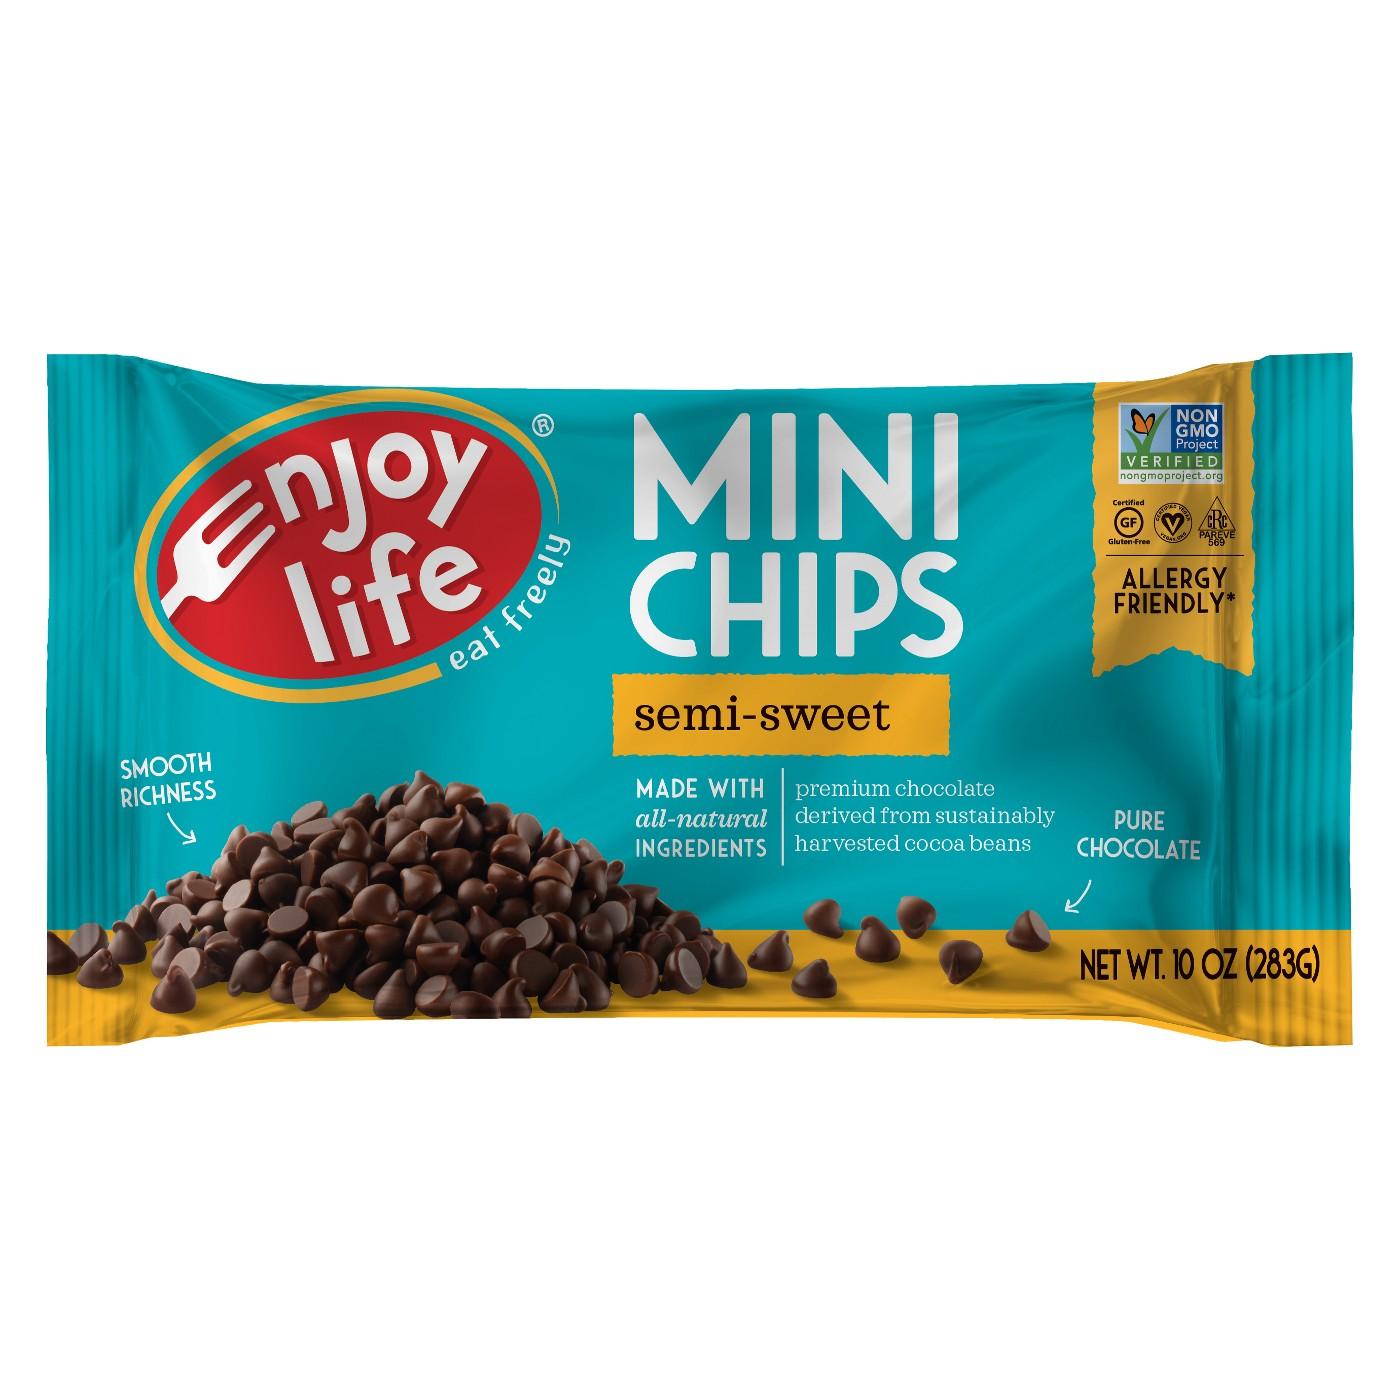 Enjoy Life Foods Gluten Free, Allergy Friendly Semi-Sweet Mini Chocolate Chips - 10oz - image 1 of 1